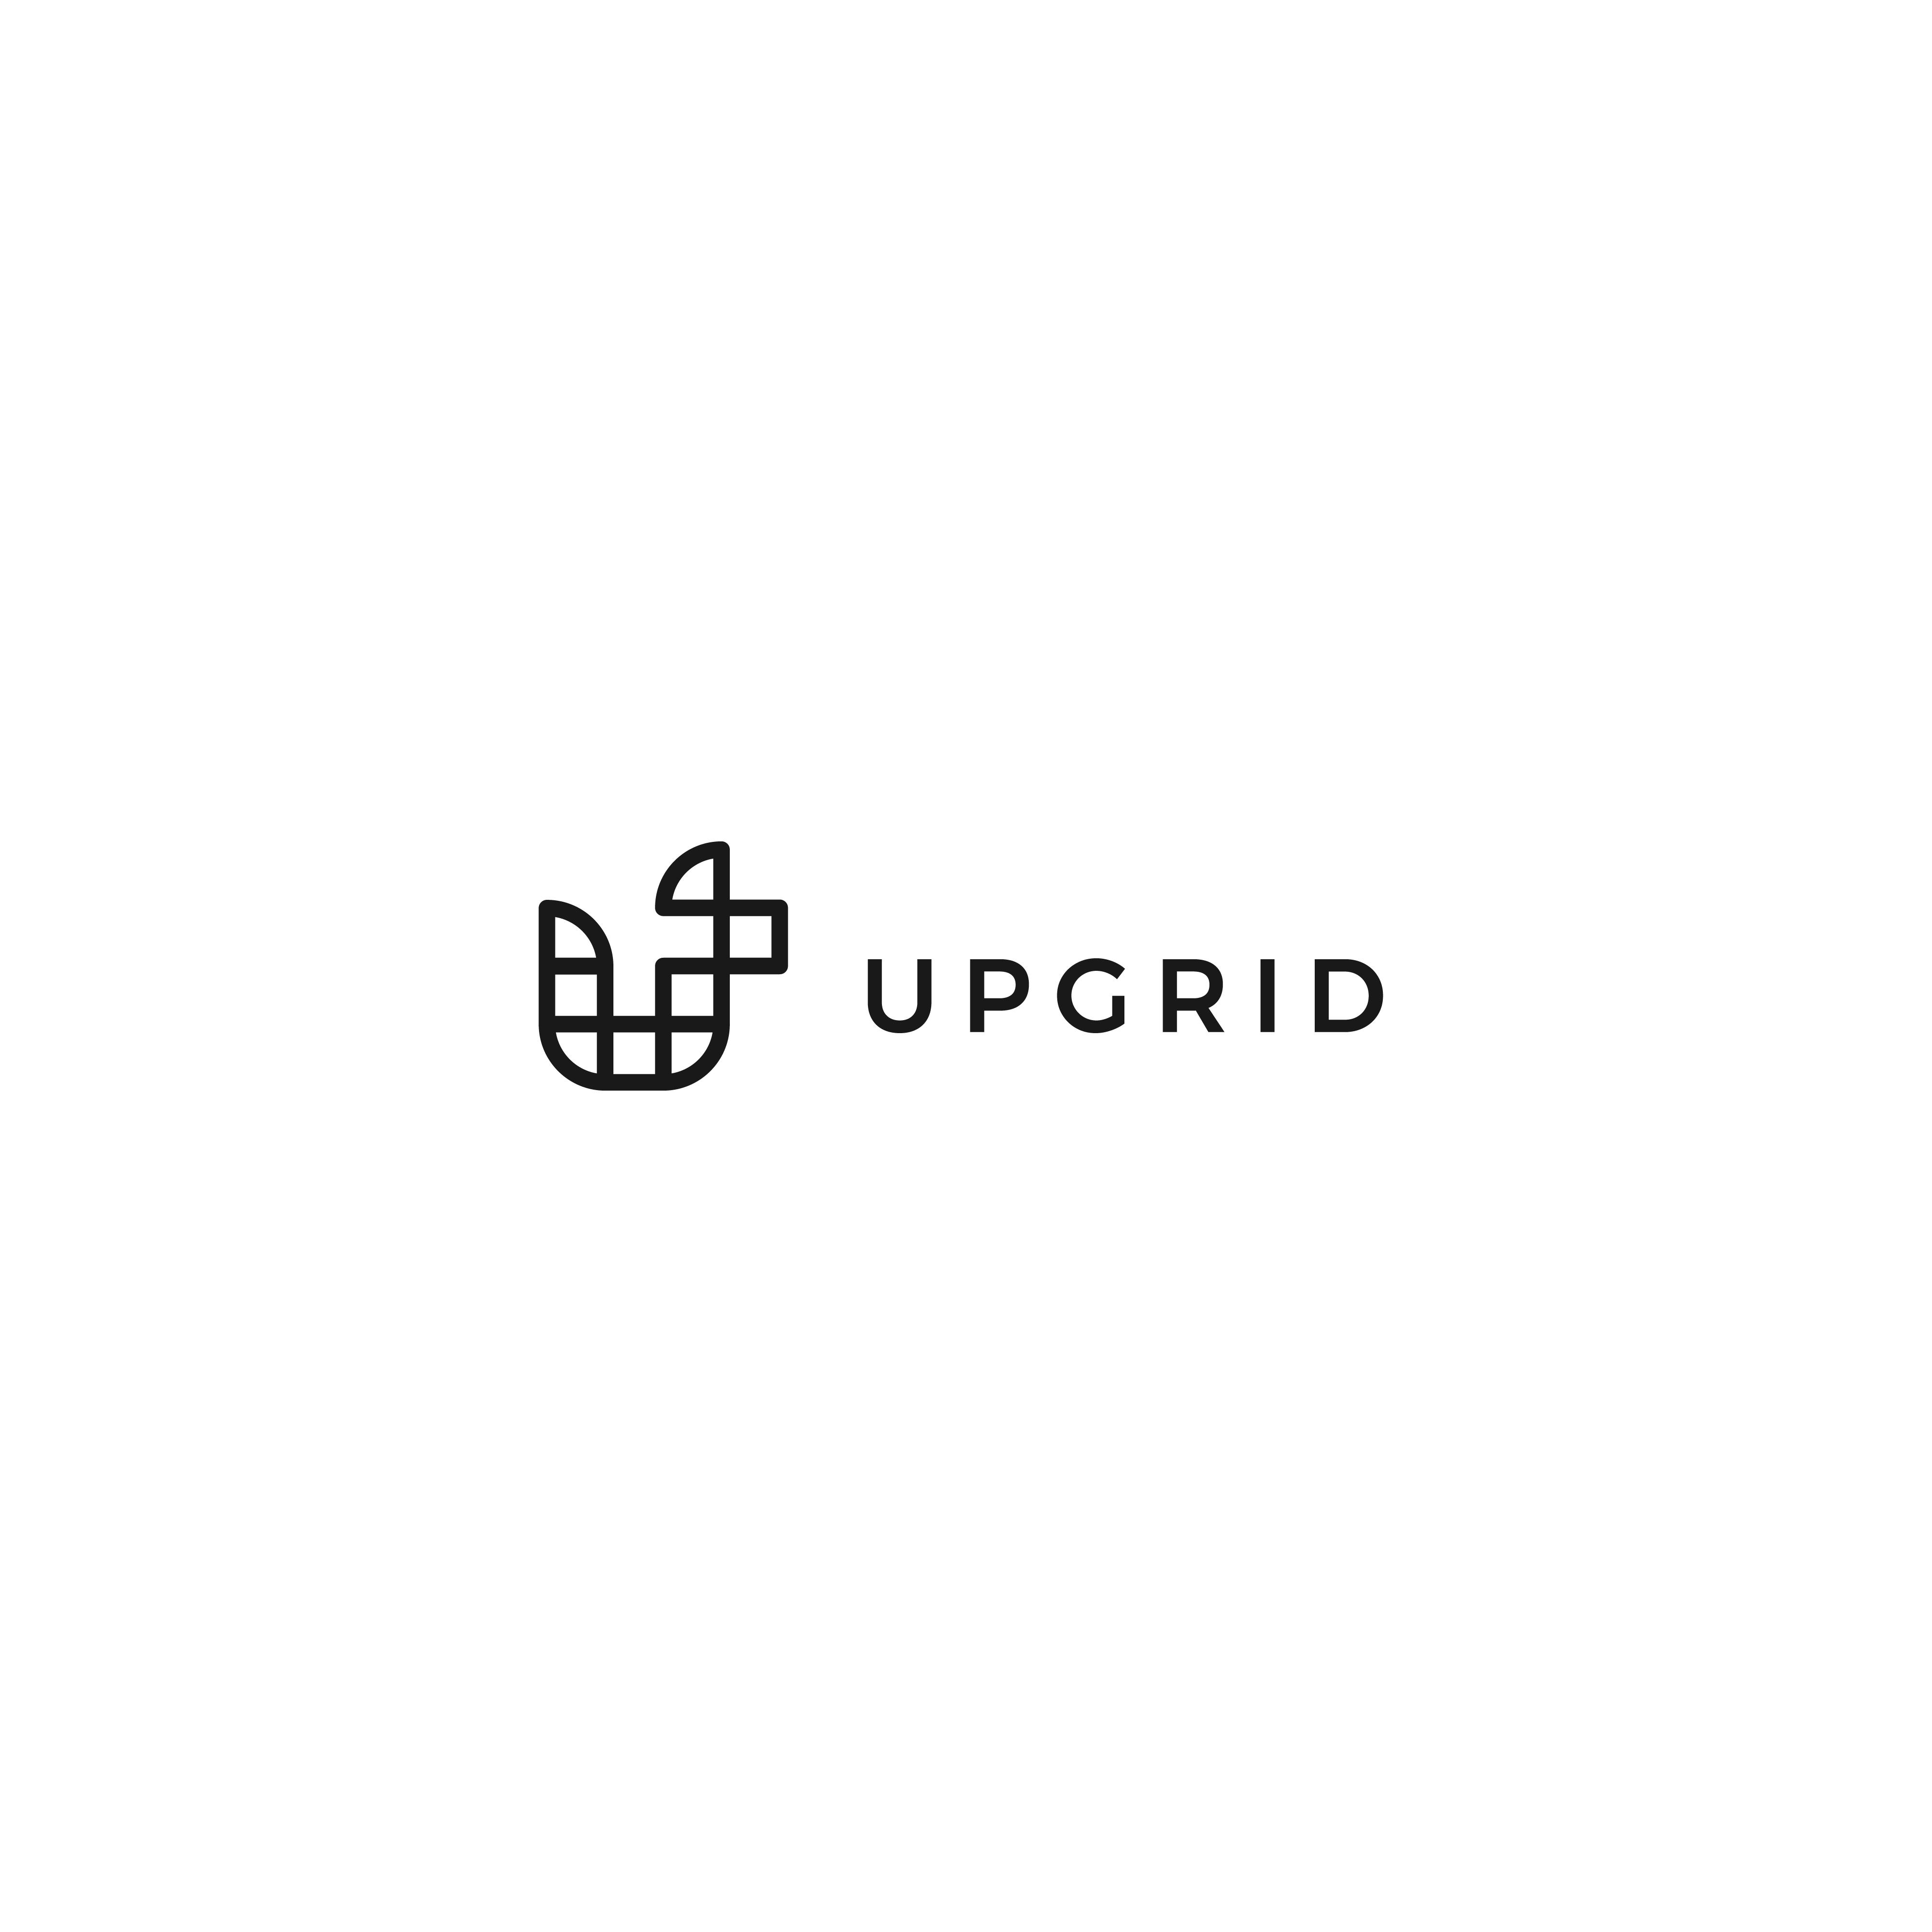 Creative logo for innovative webapp